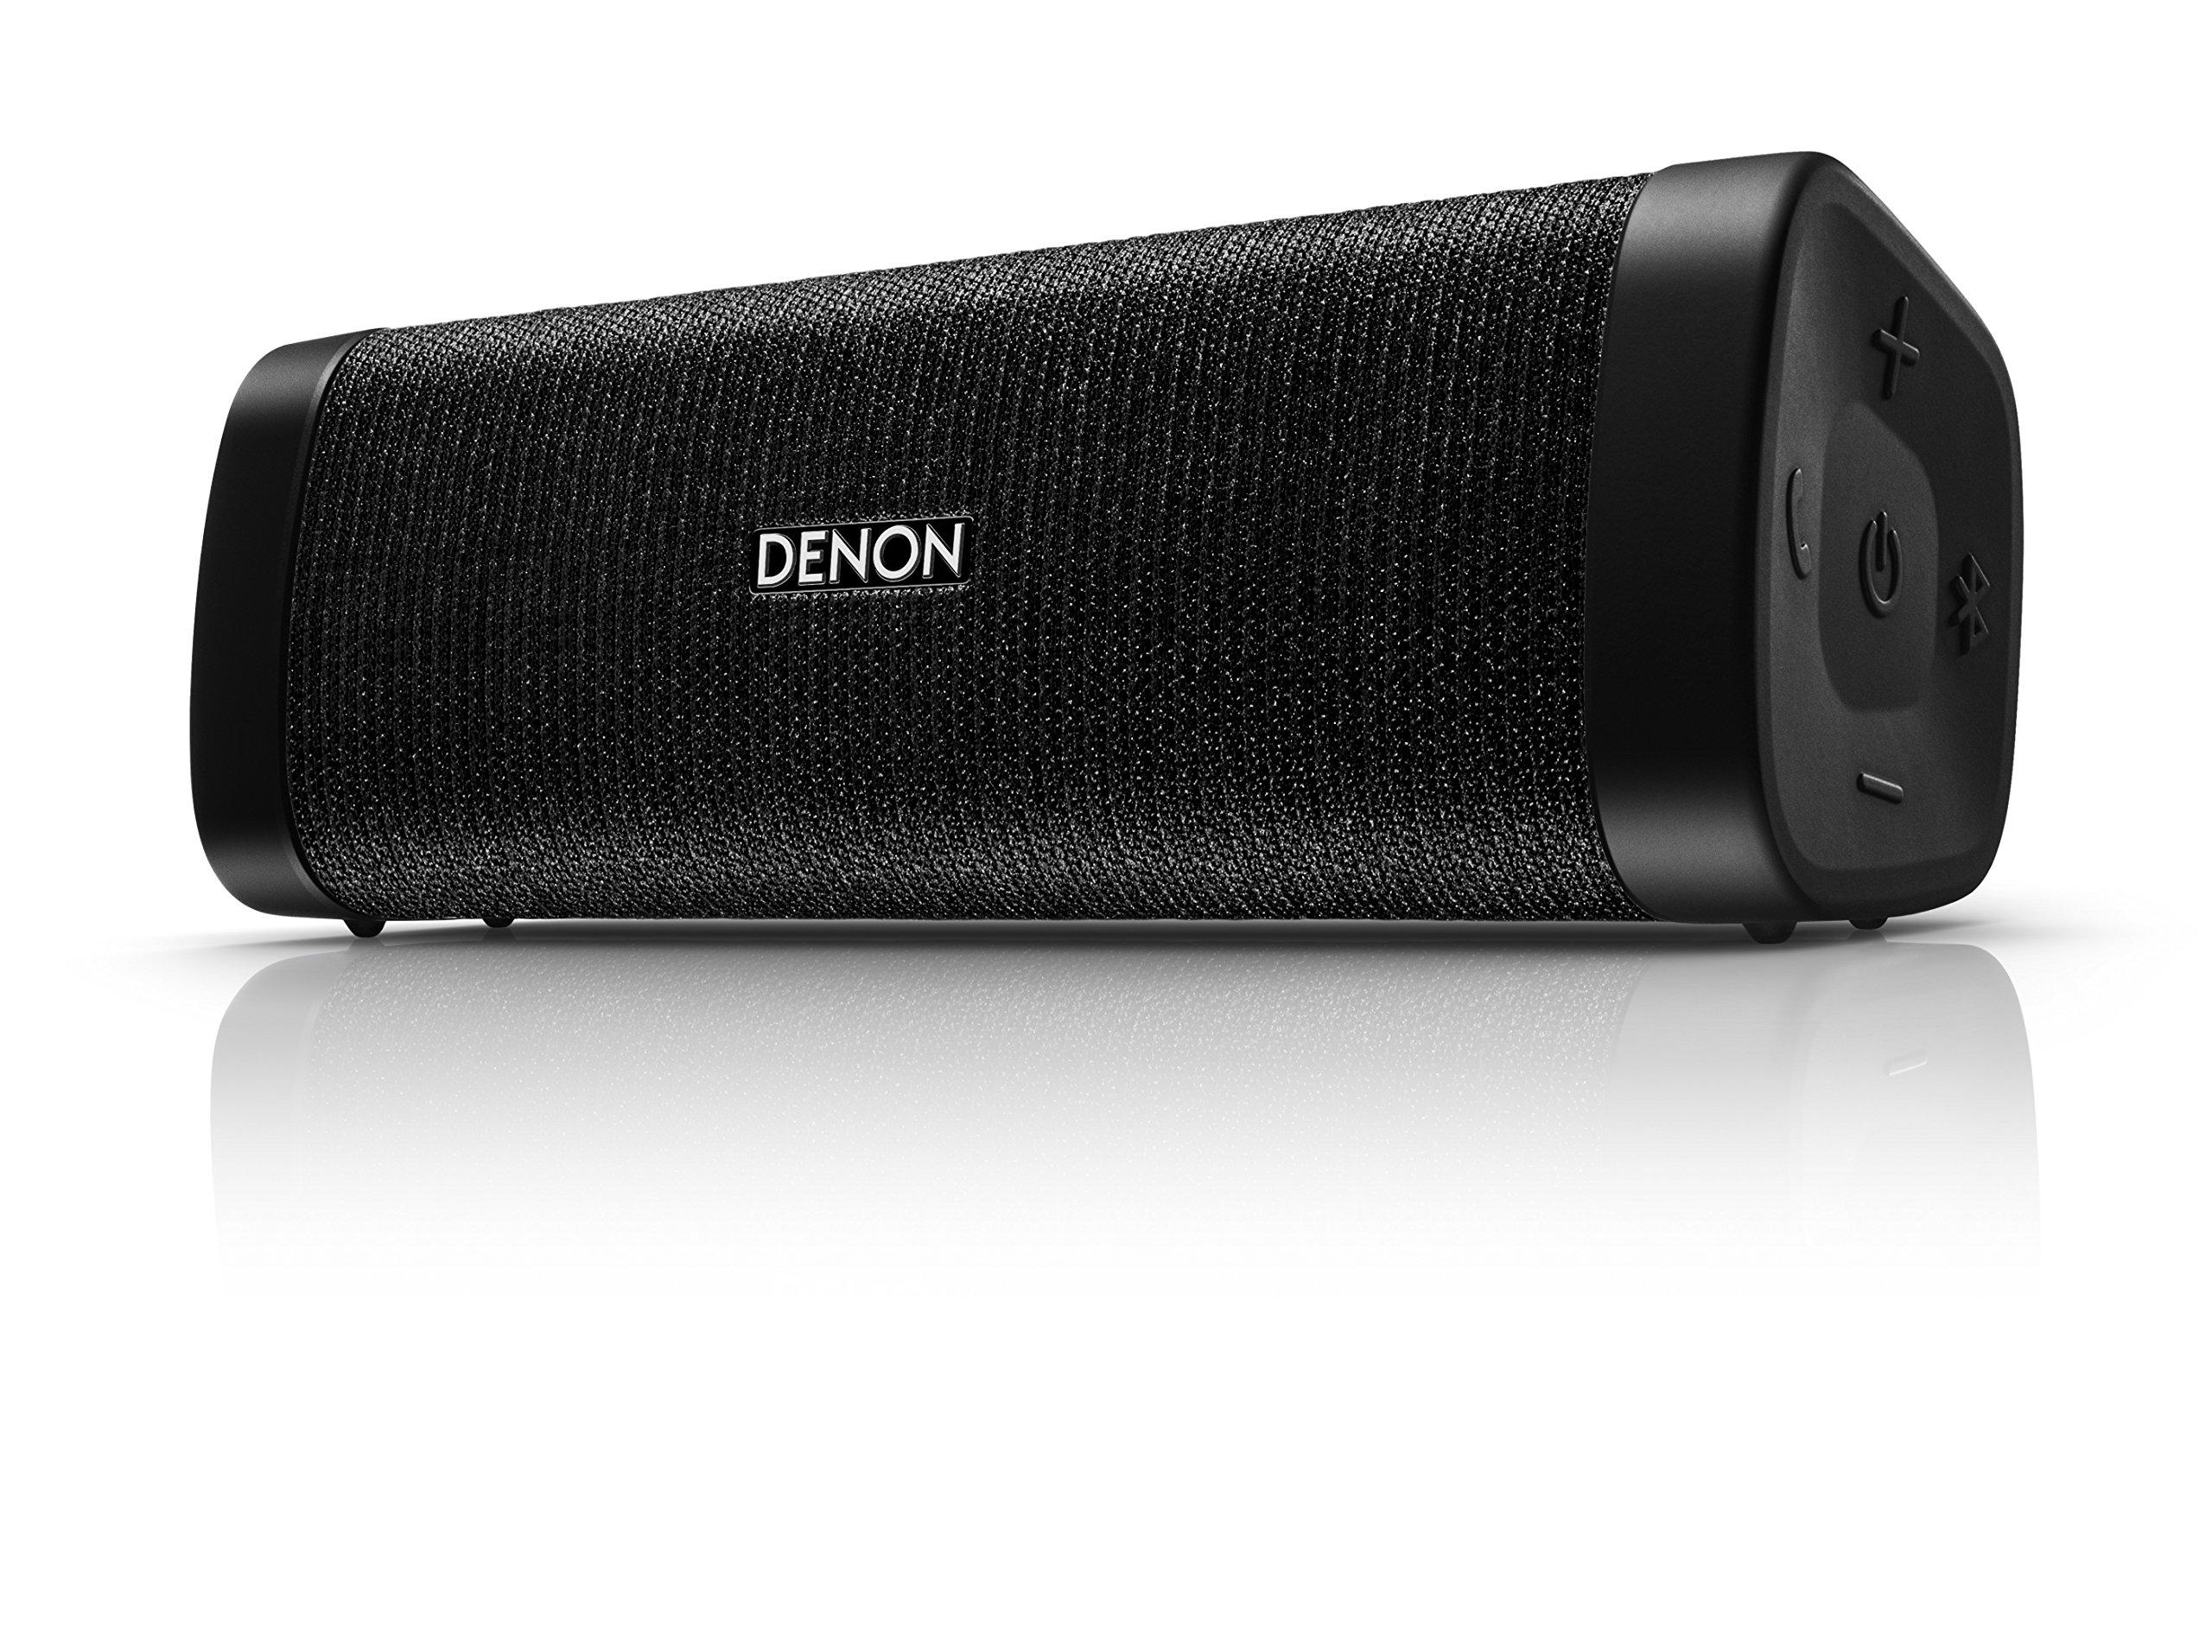 Denon DSB-150BT Envaya Mini Portable Premium Bluetooth Speaker - Black